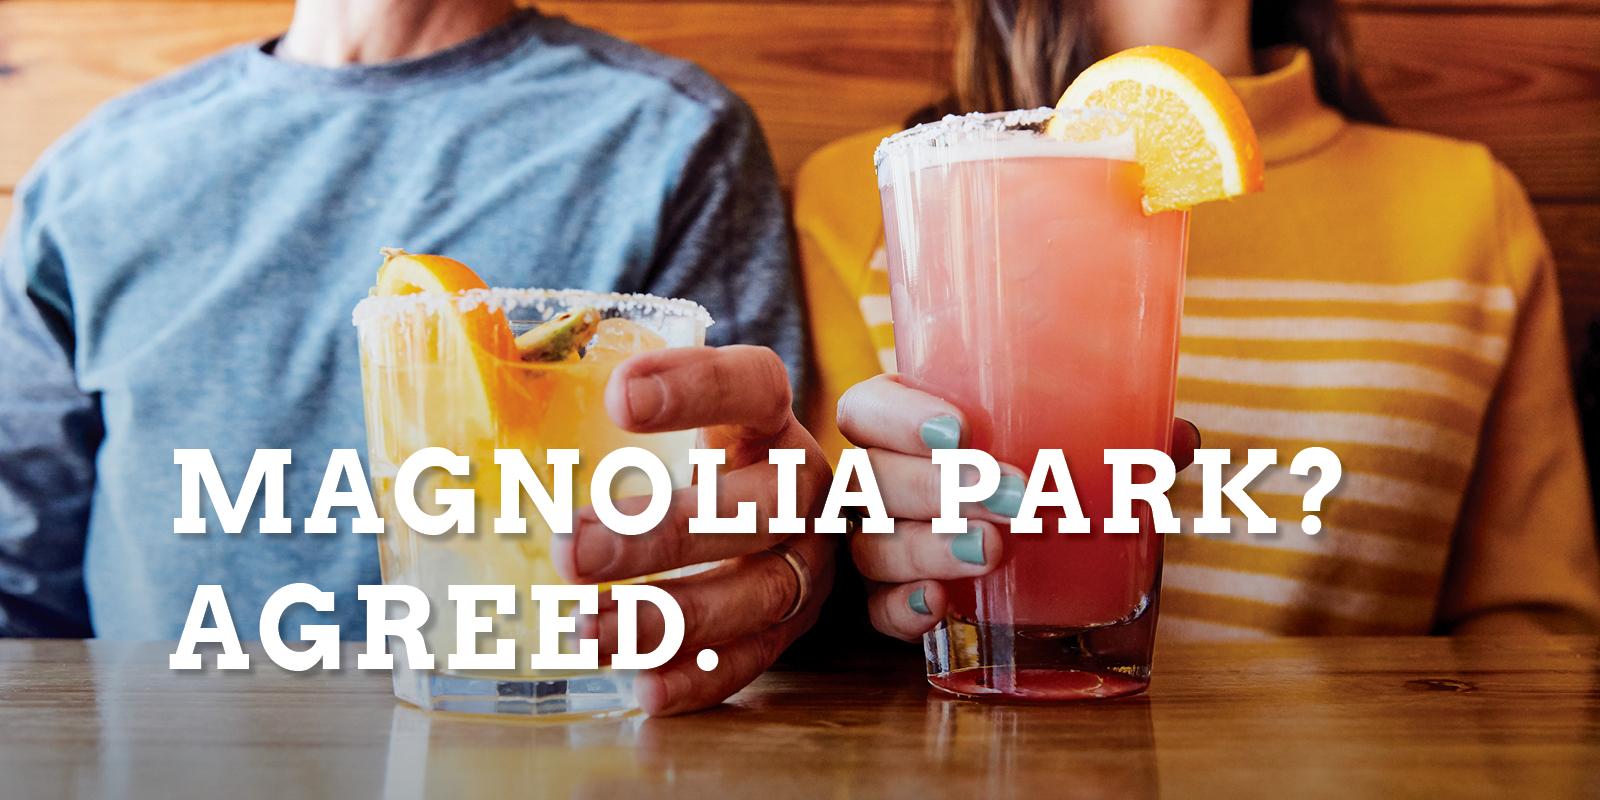 Magnolia Park Agreed